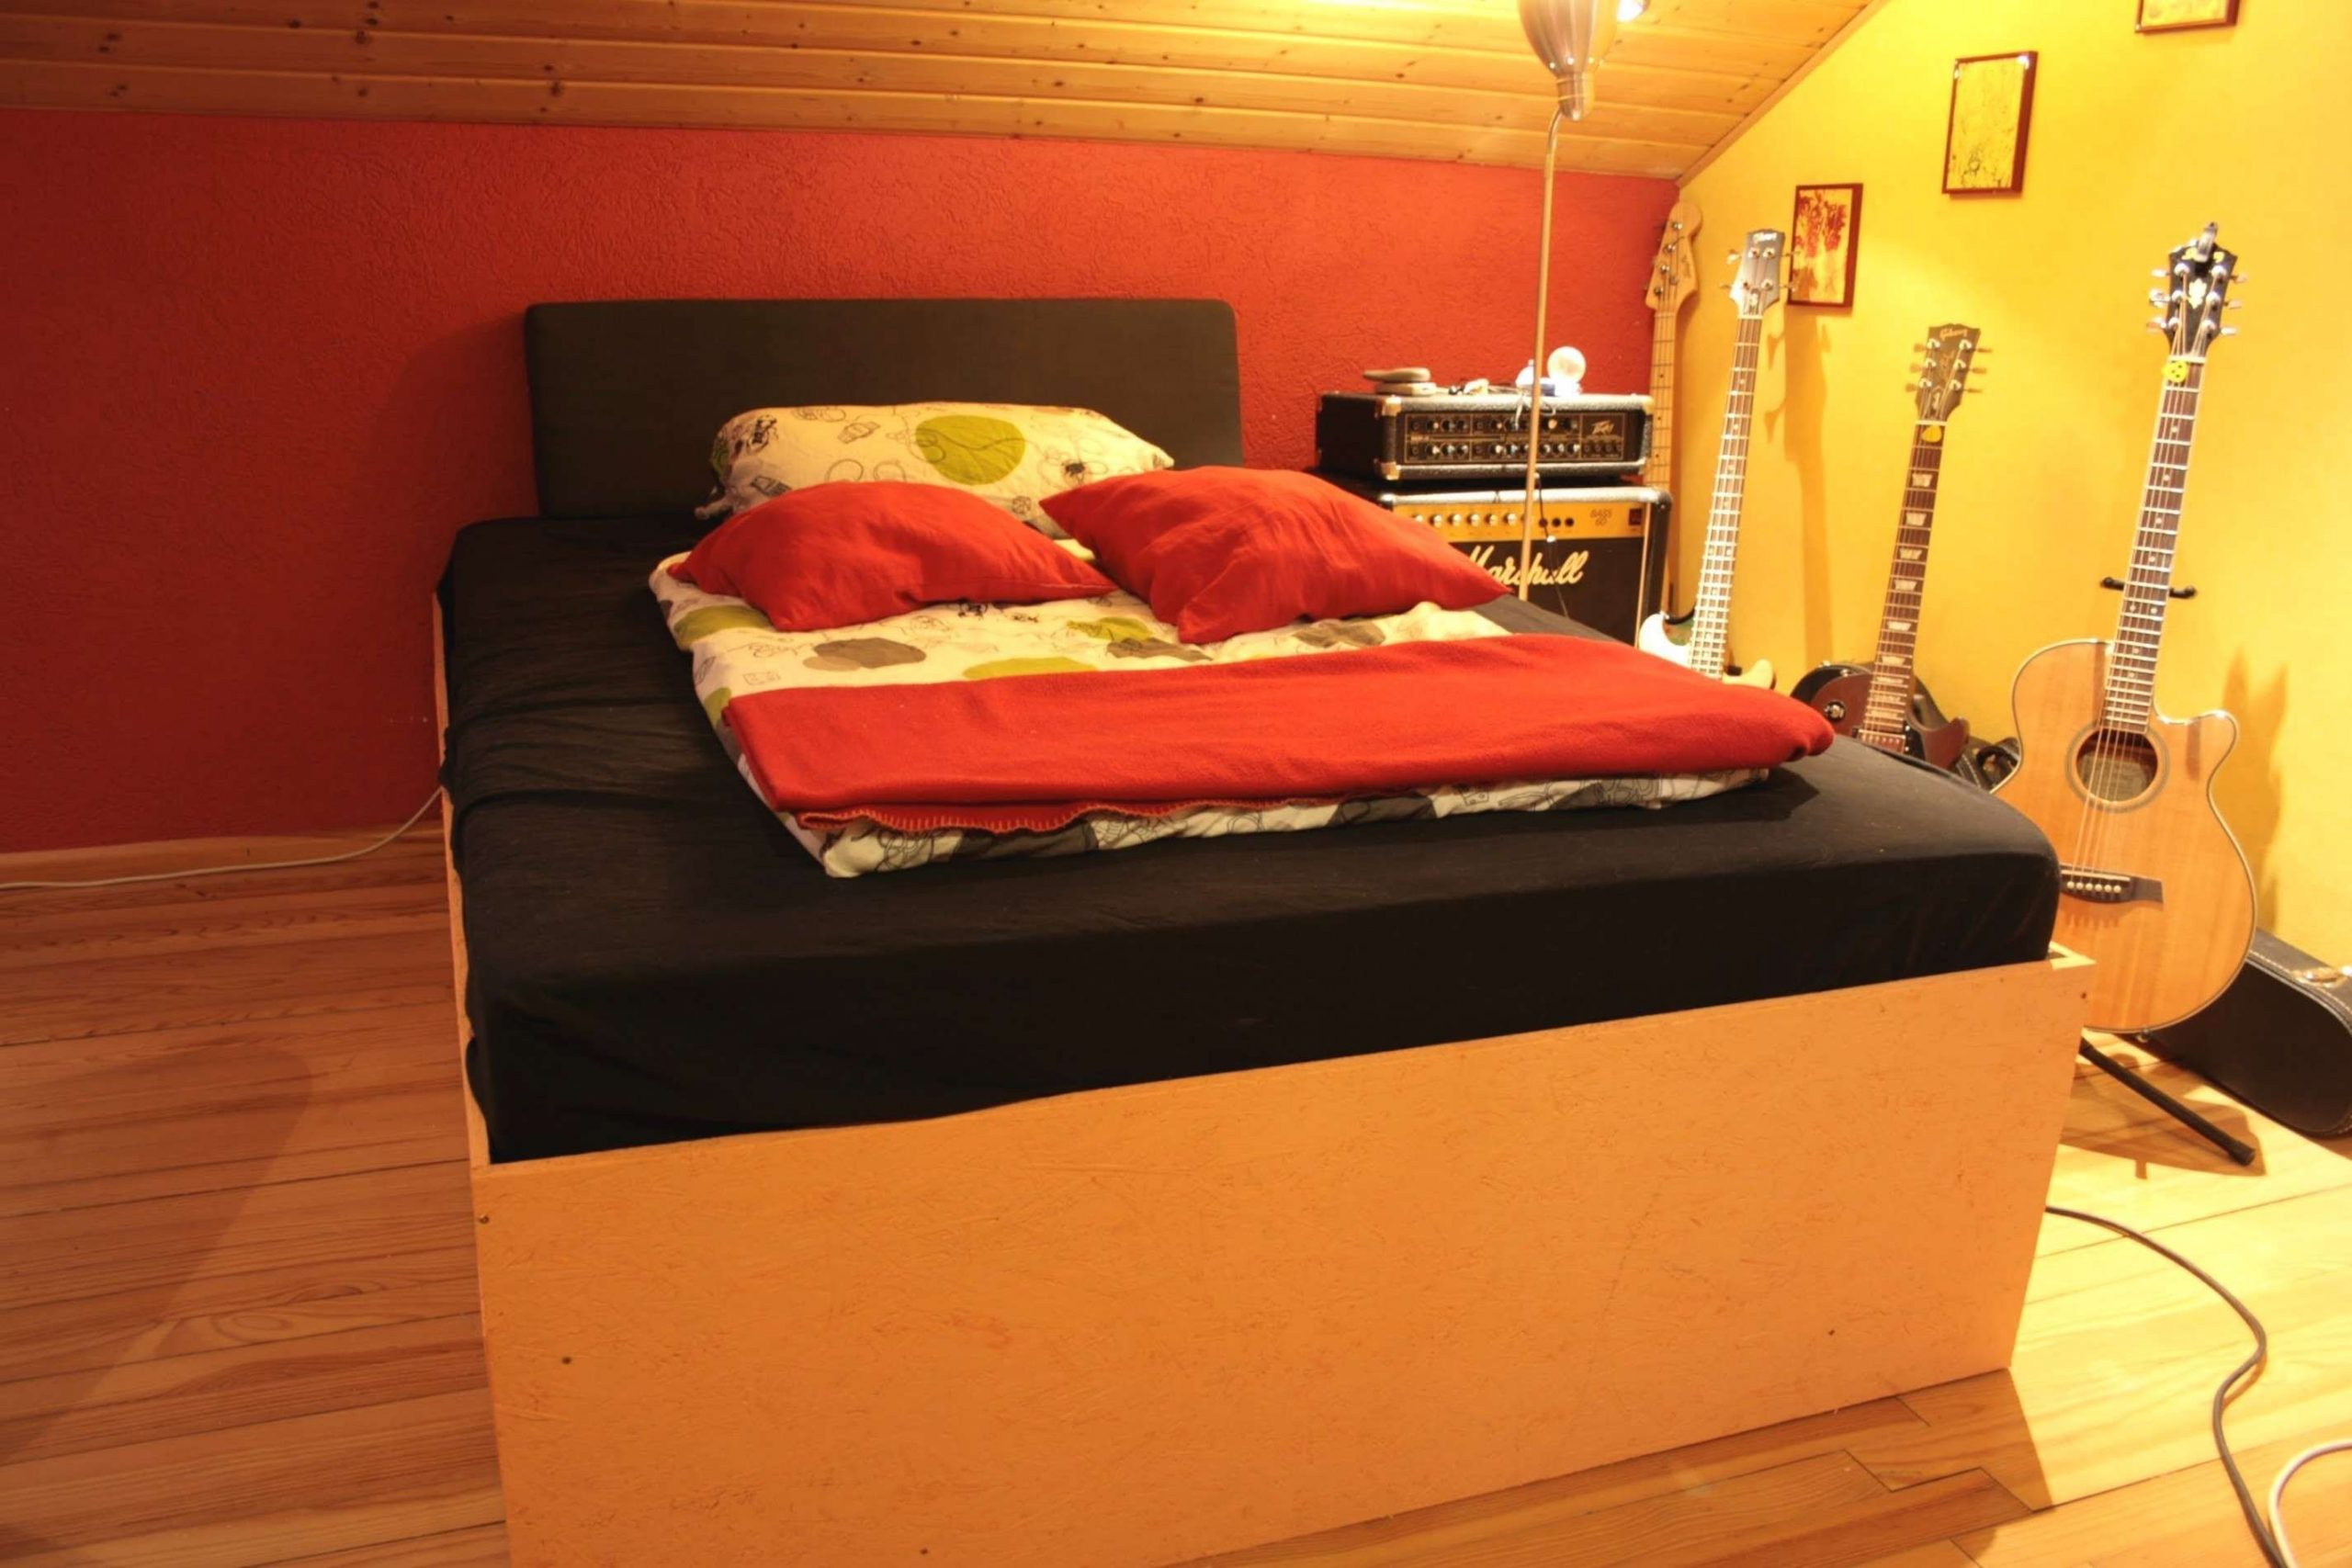 Full Size of Bett Paletten 140x200 Kaufen Ikea Aus Bauen Anleitung Selber 200x200 100x200 180x200 Palette Bank Sthlen Inspirierend Sonoma Eiche Weißes 90x200 Feng Shui Wohnzimmer Bett Paletten